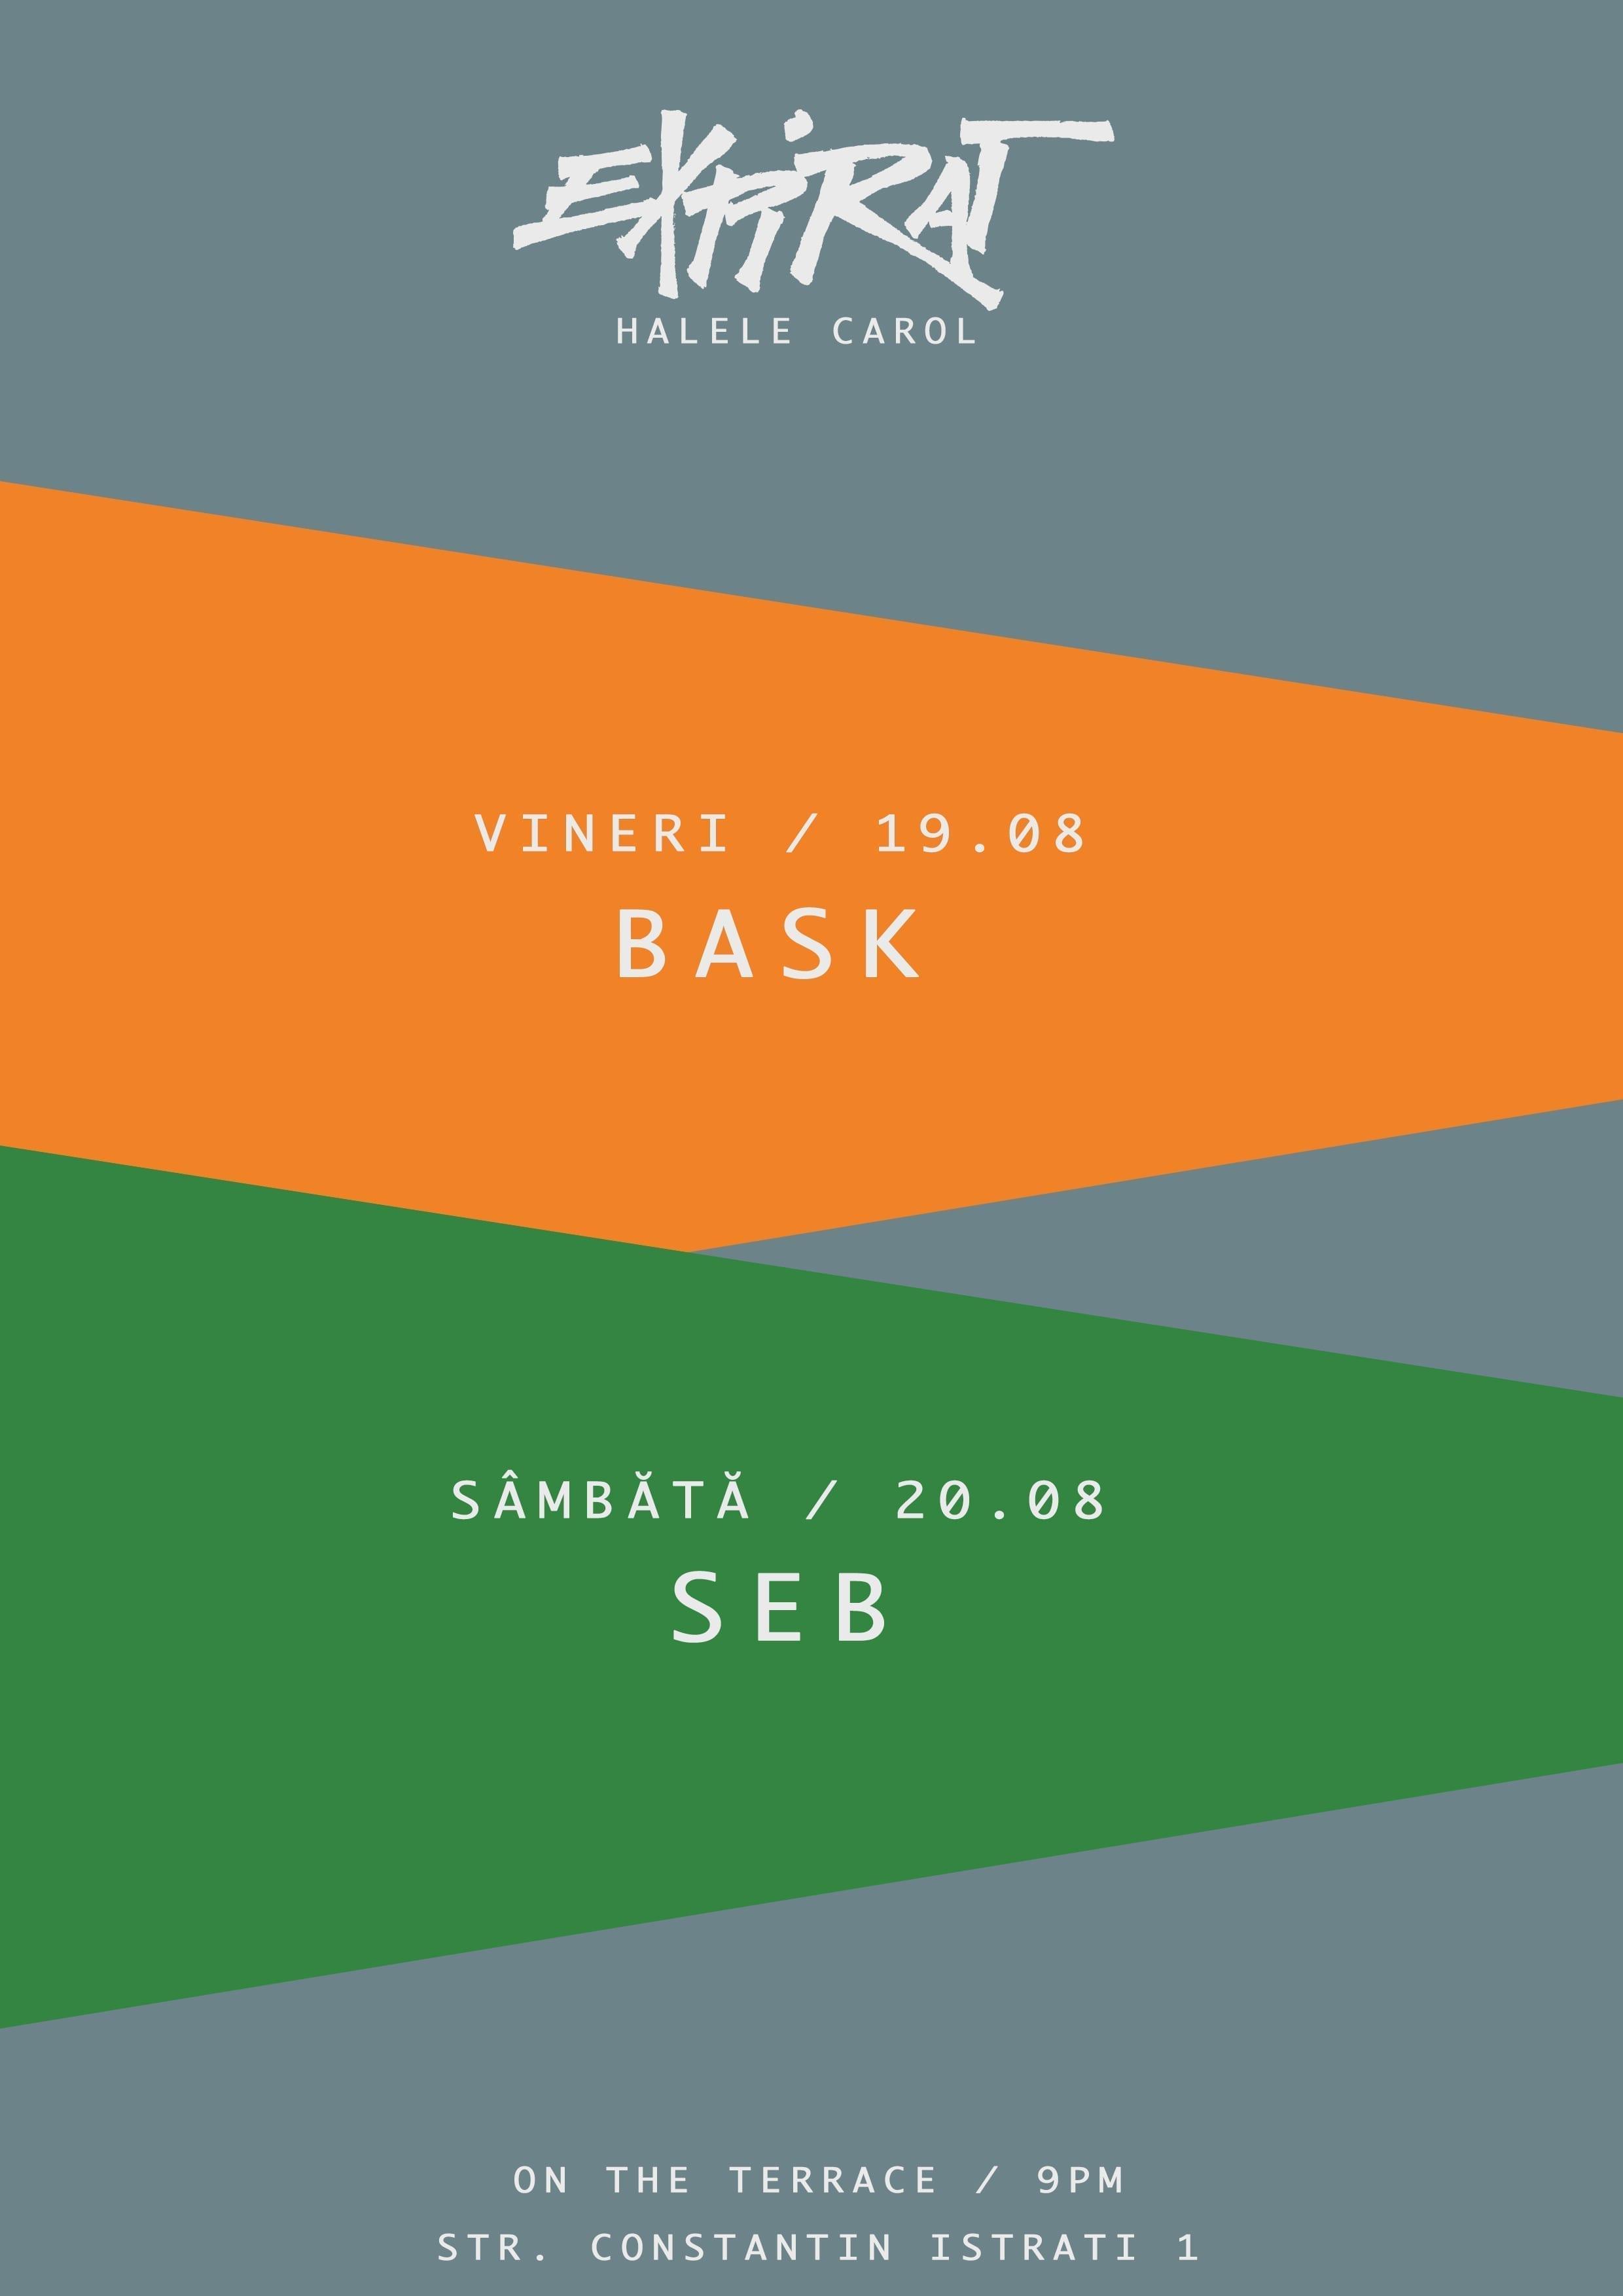 Bask, Seb @ Expirat Halele Carol